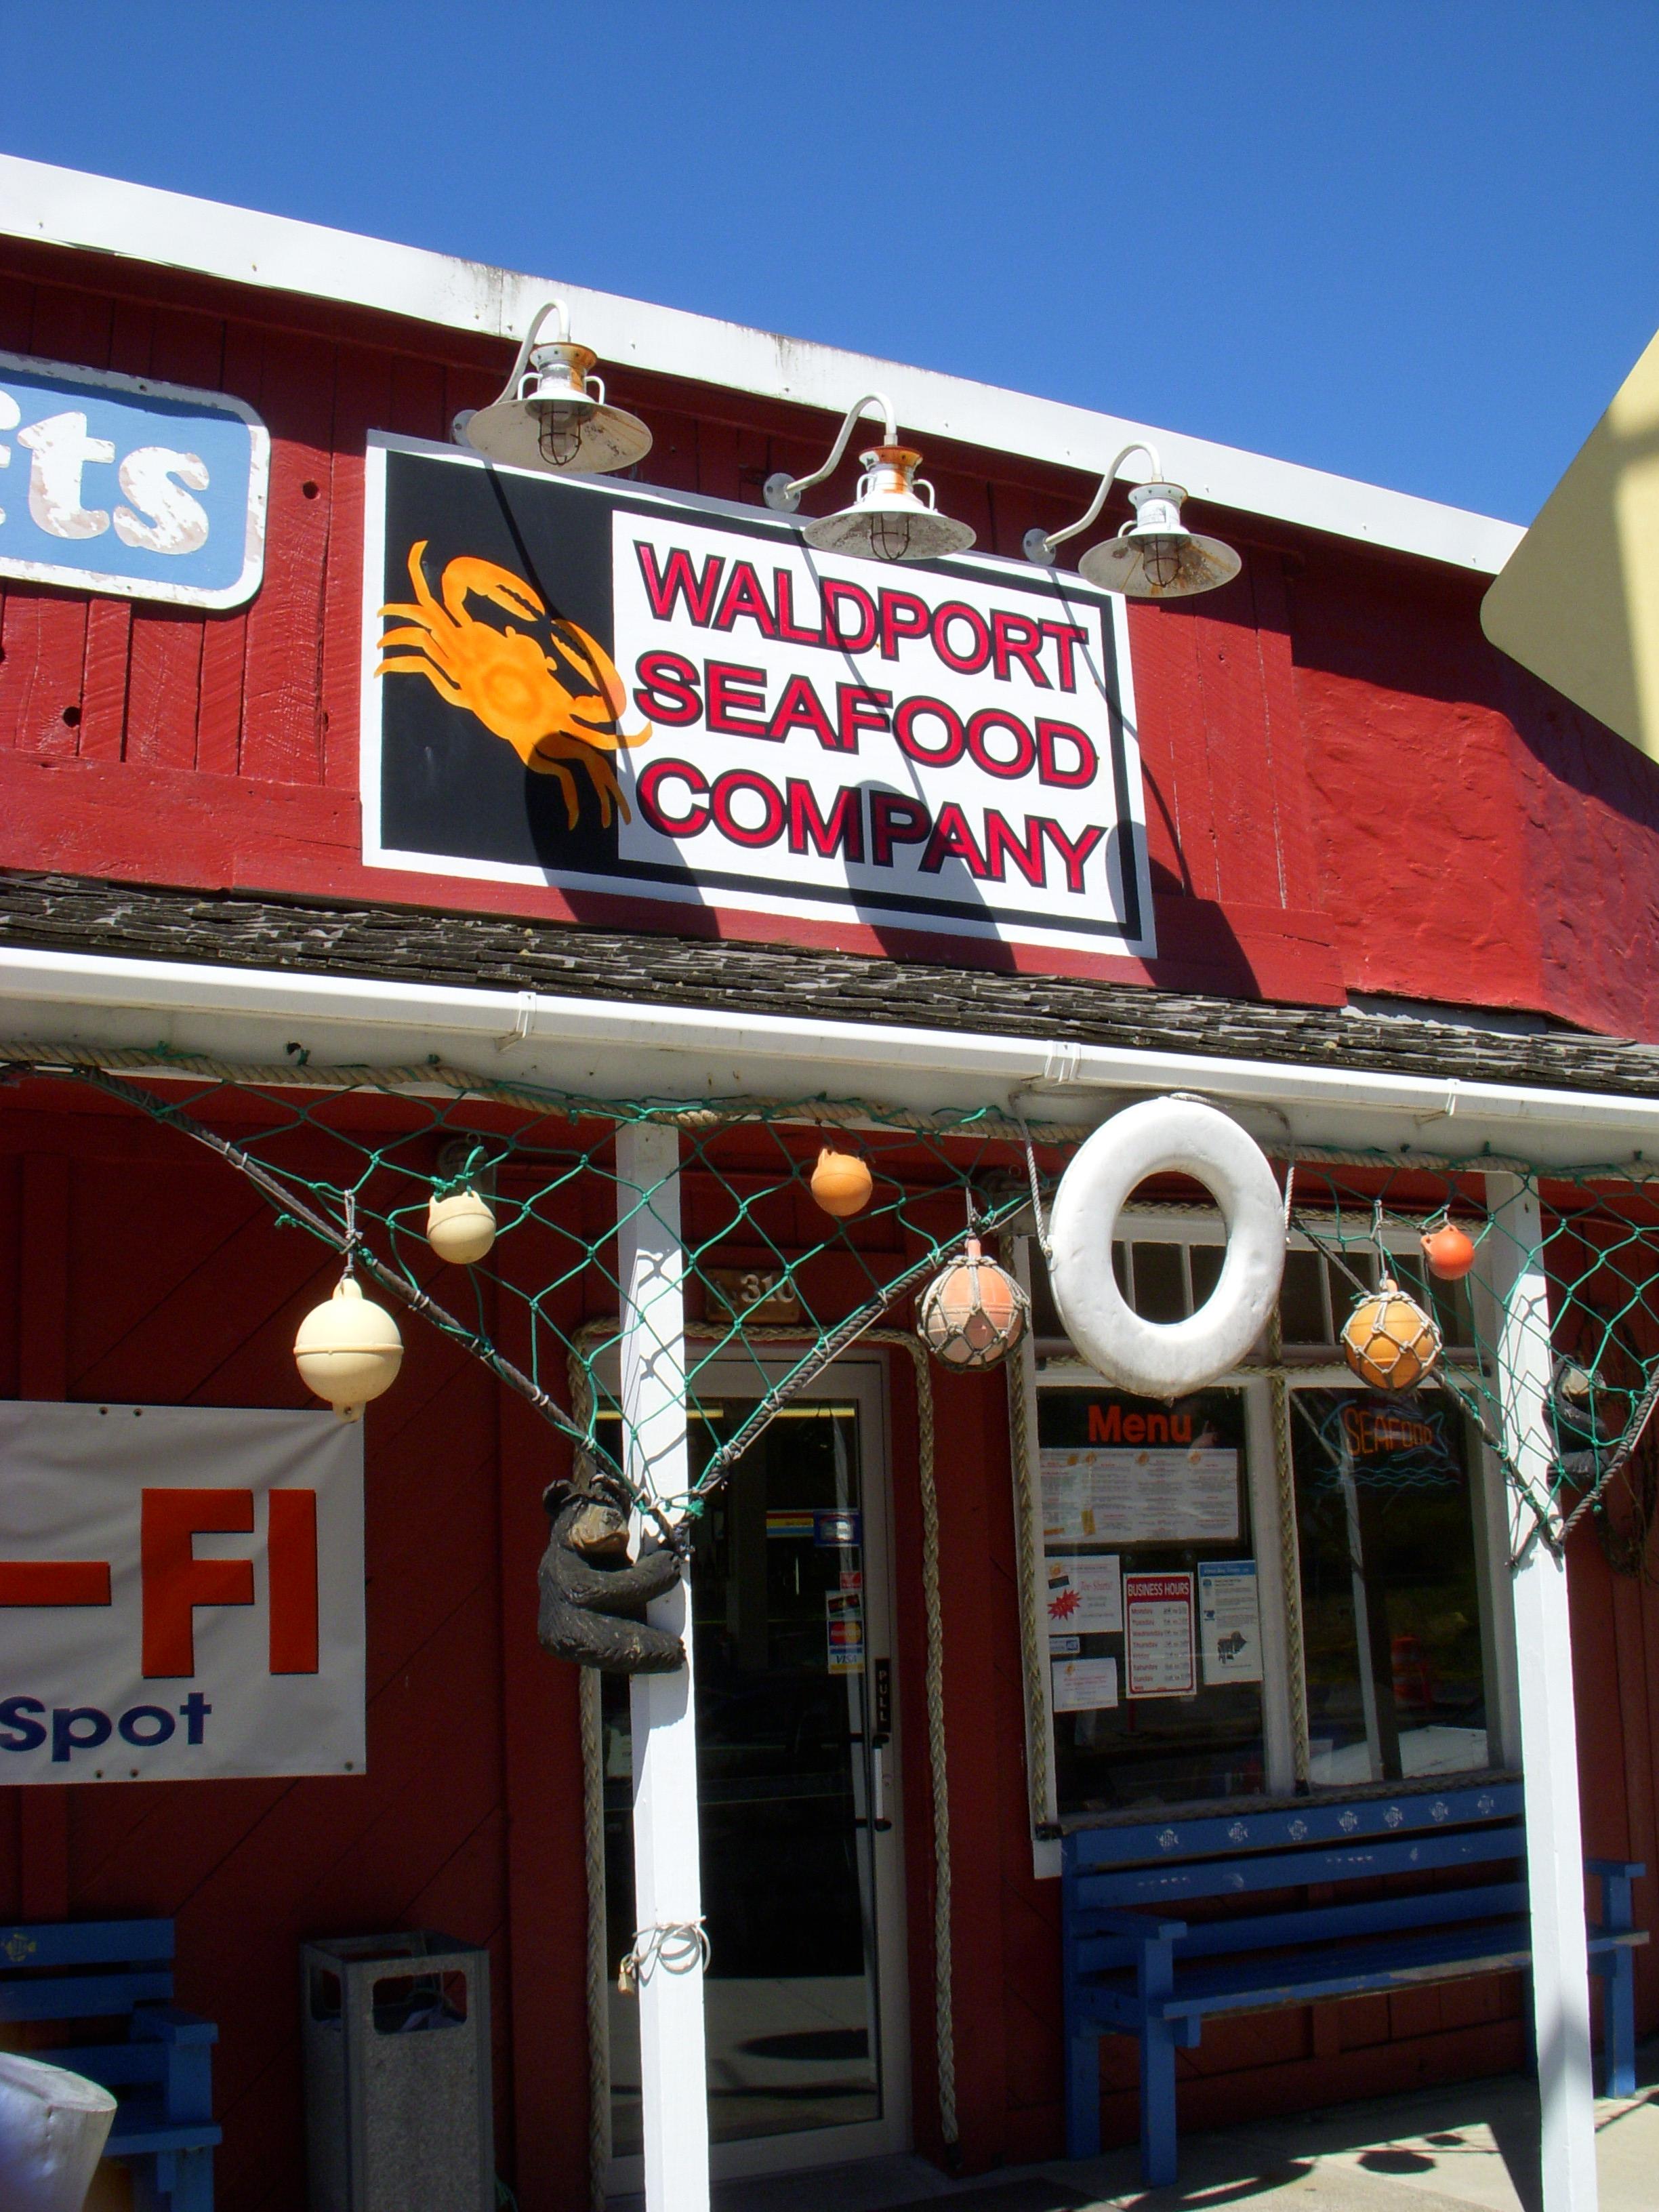 Waldport seafood company